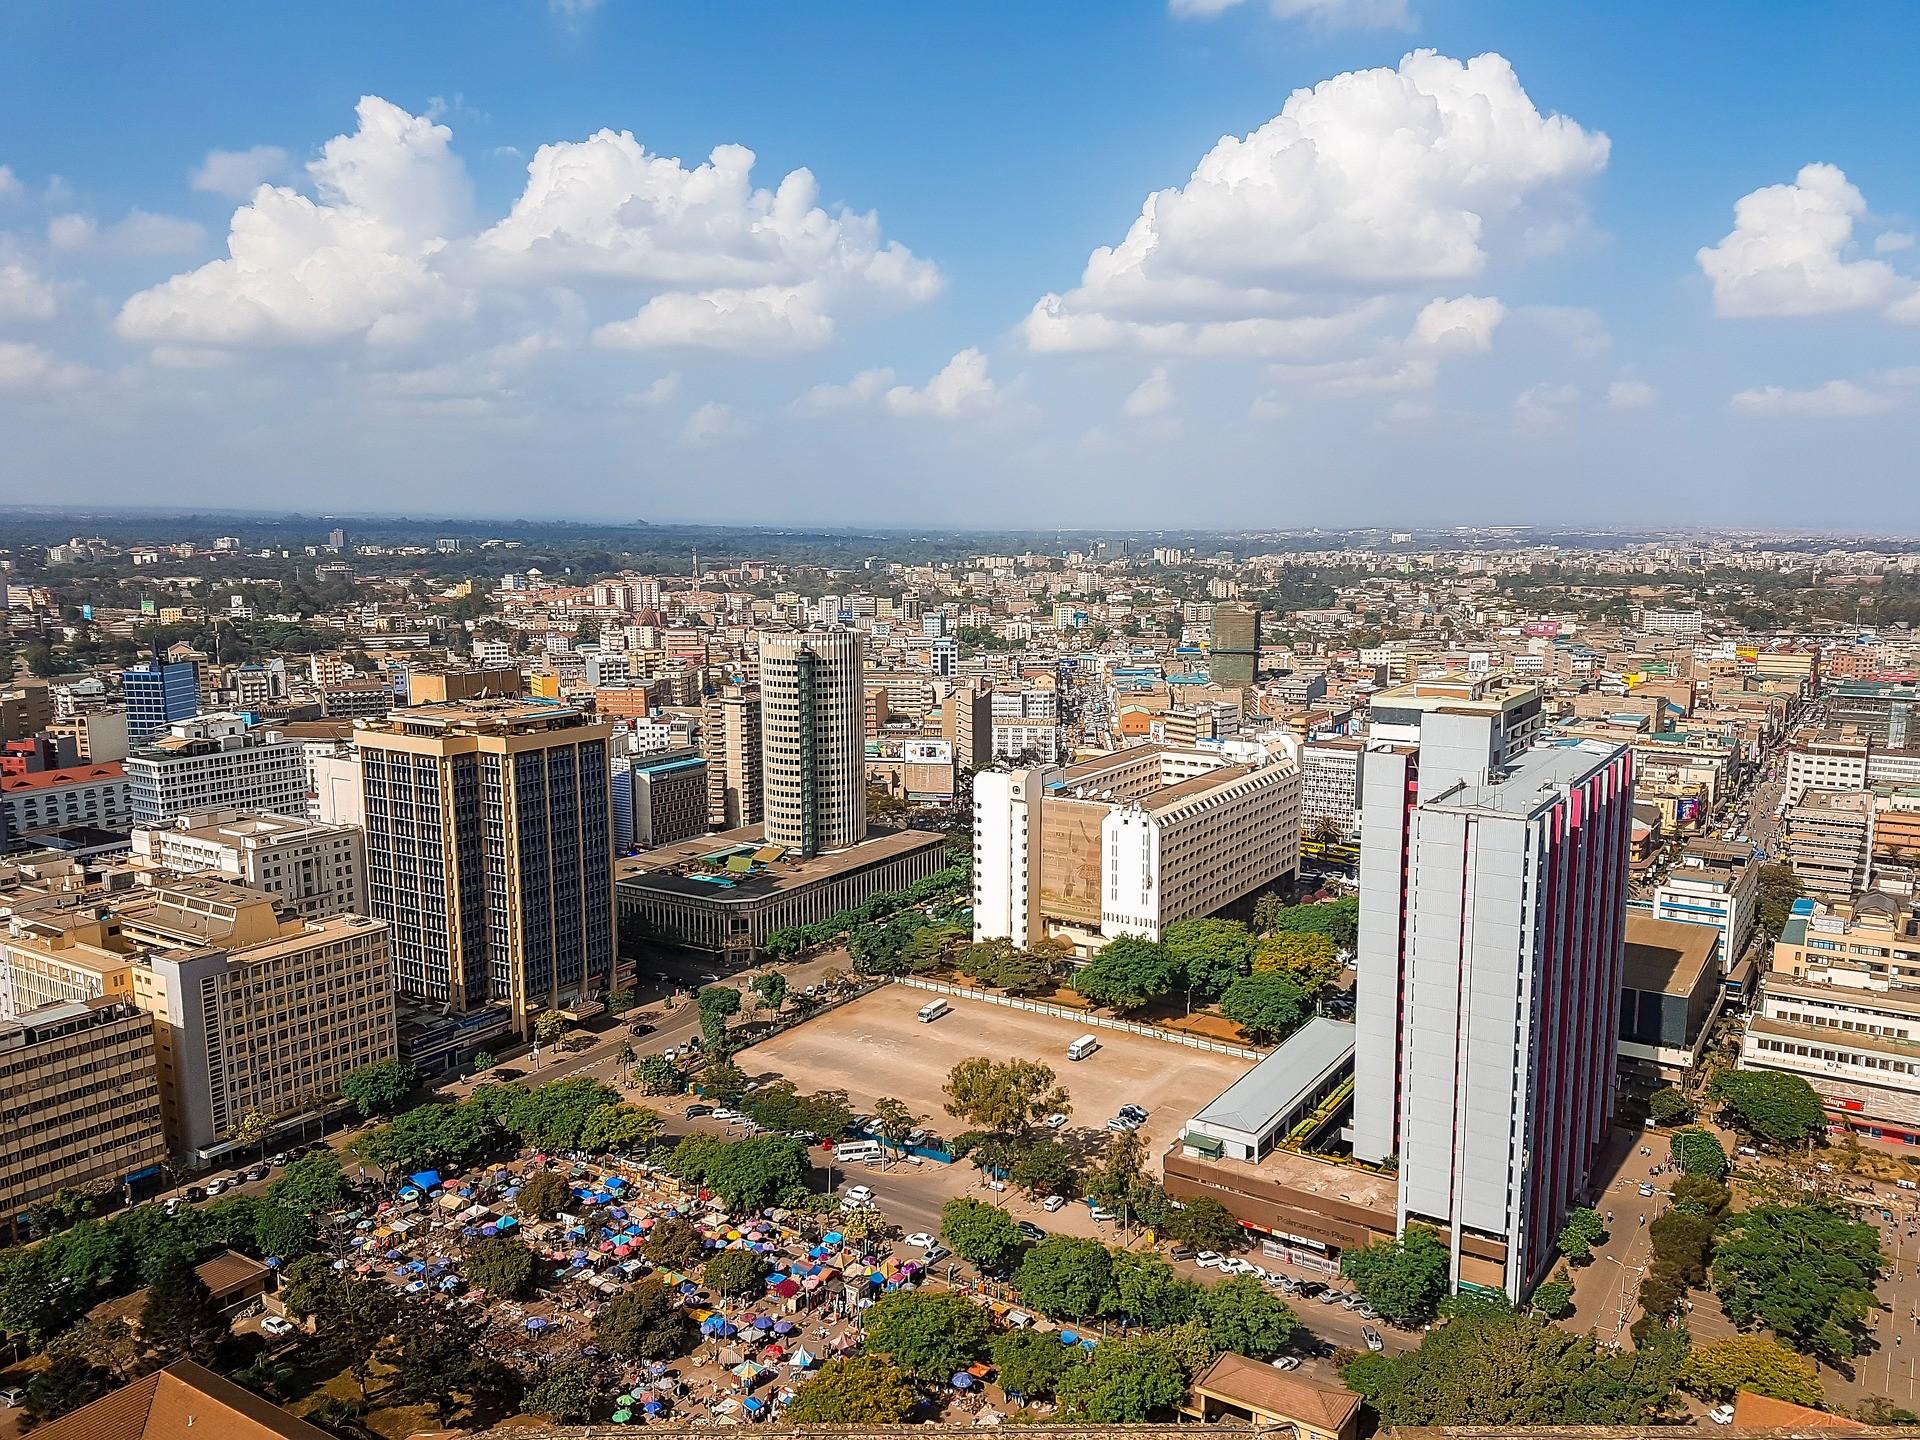 vistas aéreas de nairobi, kenia